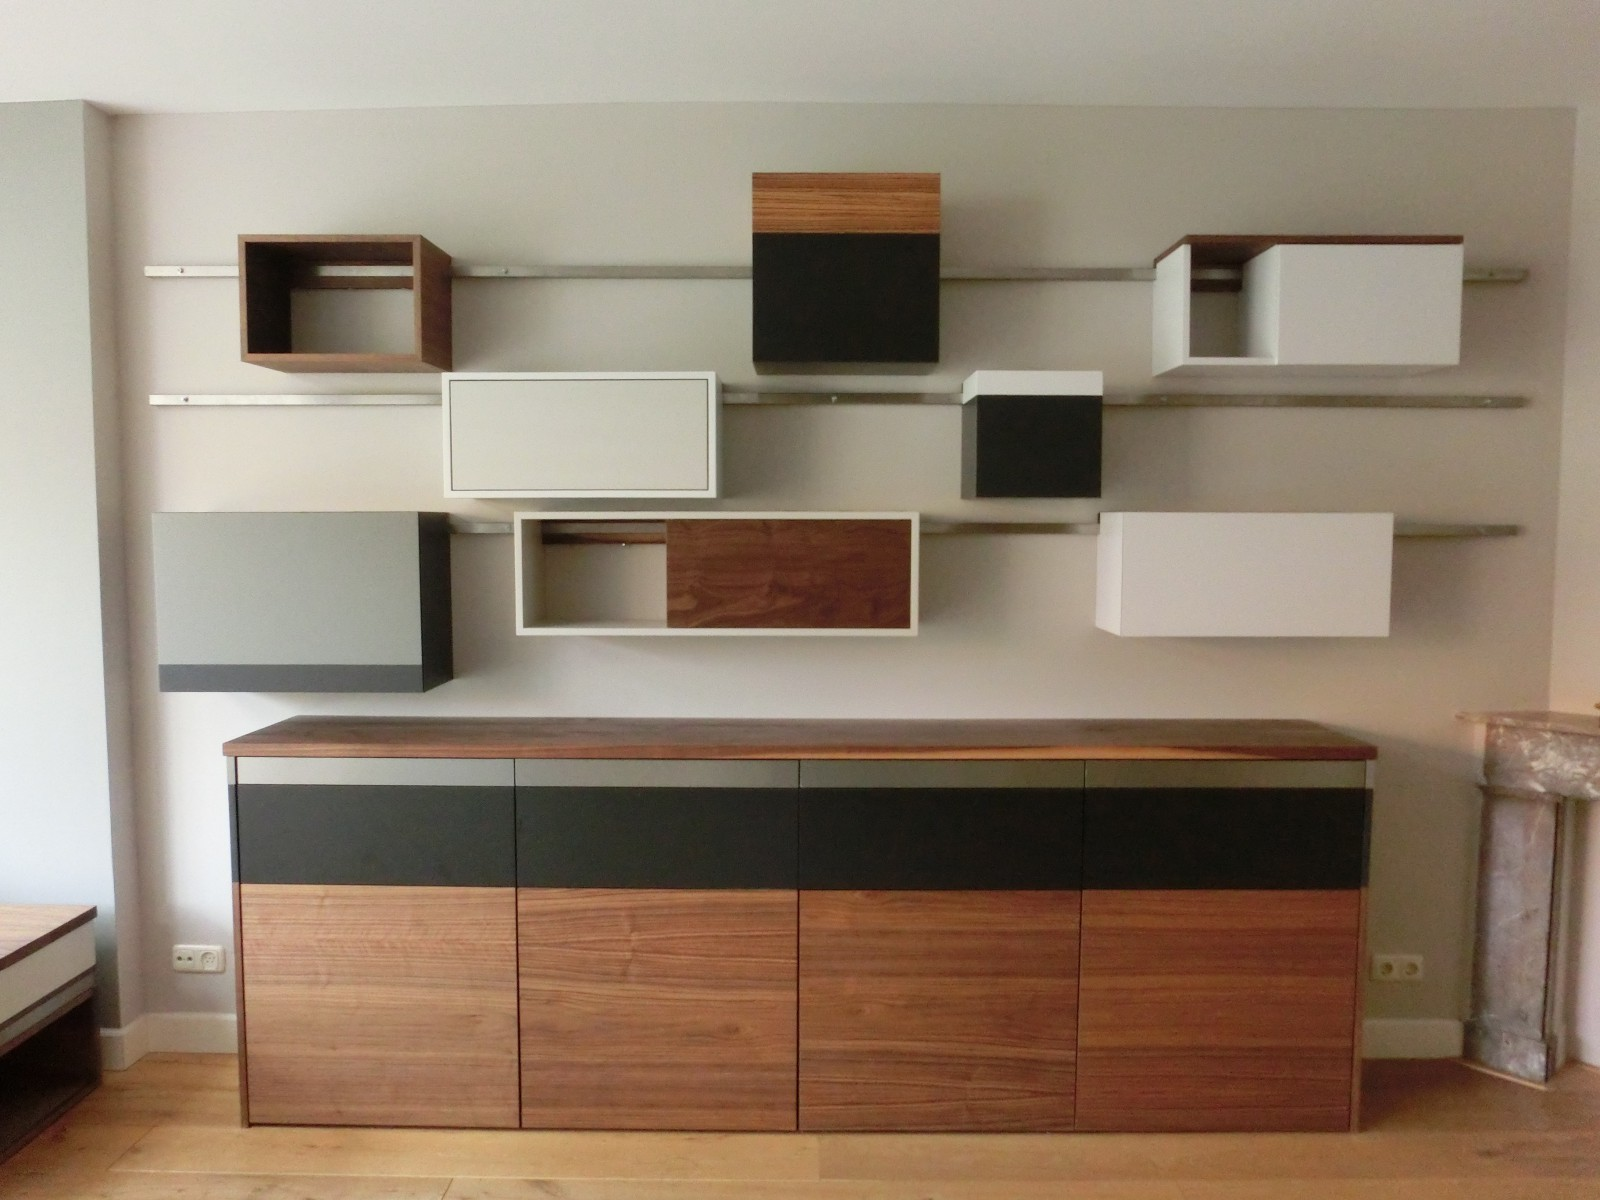 Custom made cupboards Voorburg - design and fabrication by Deuvel Design